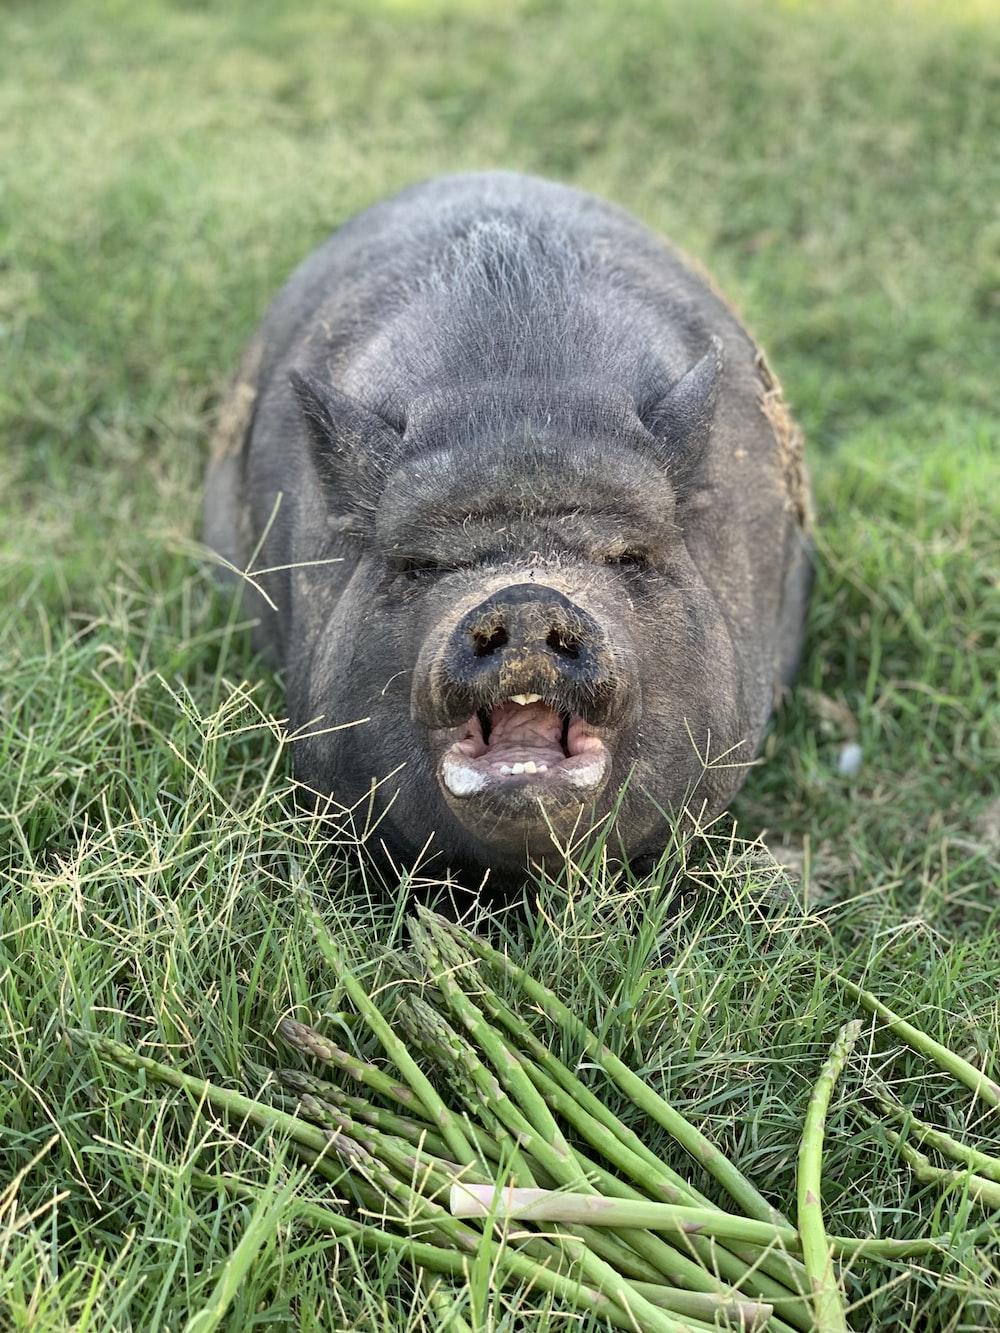 black pig lying on green grass during daytime